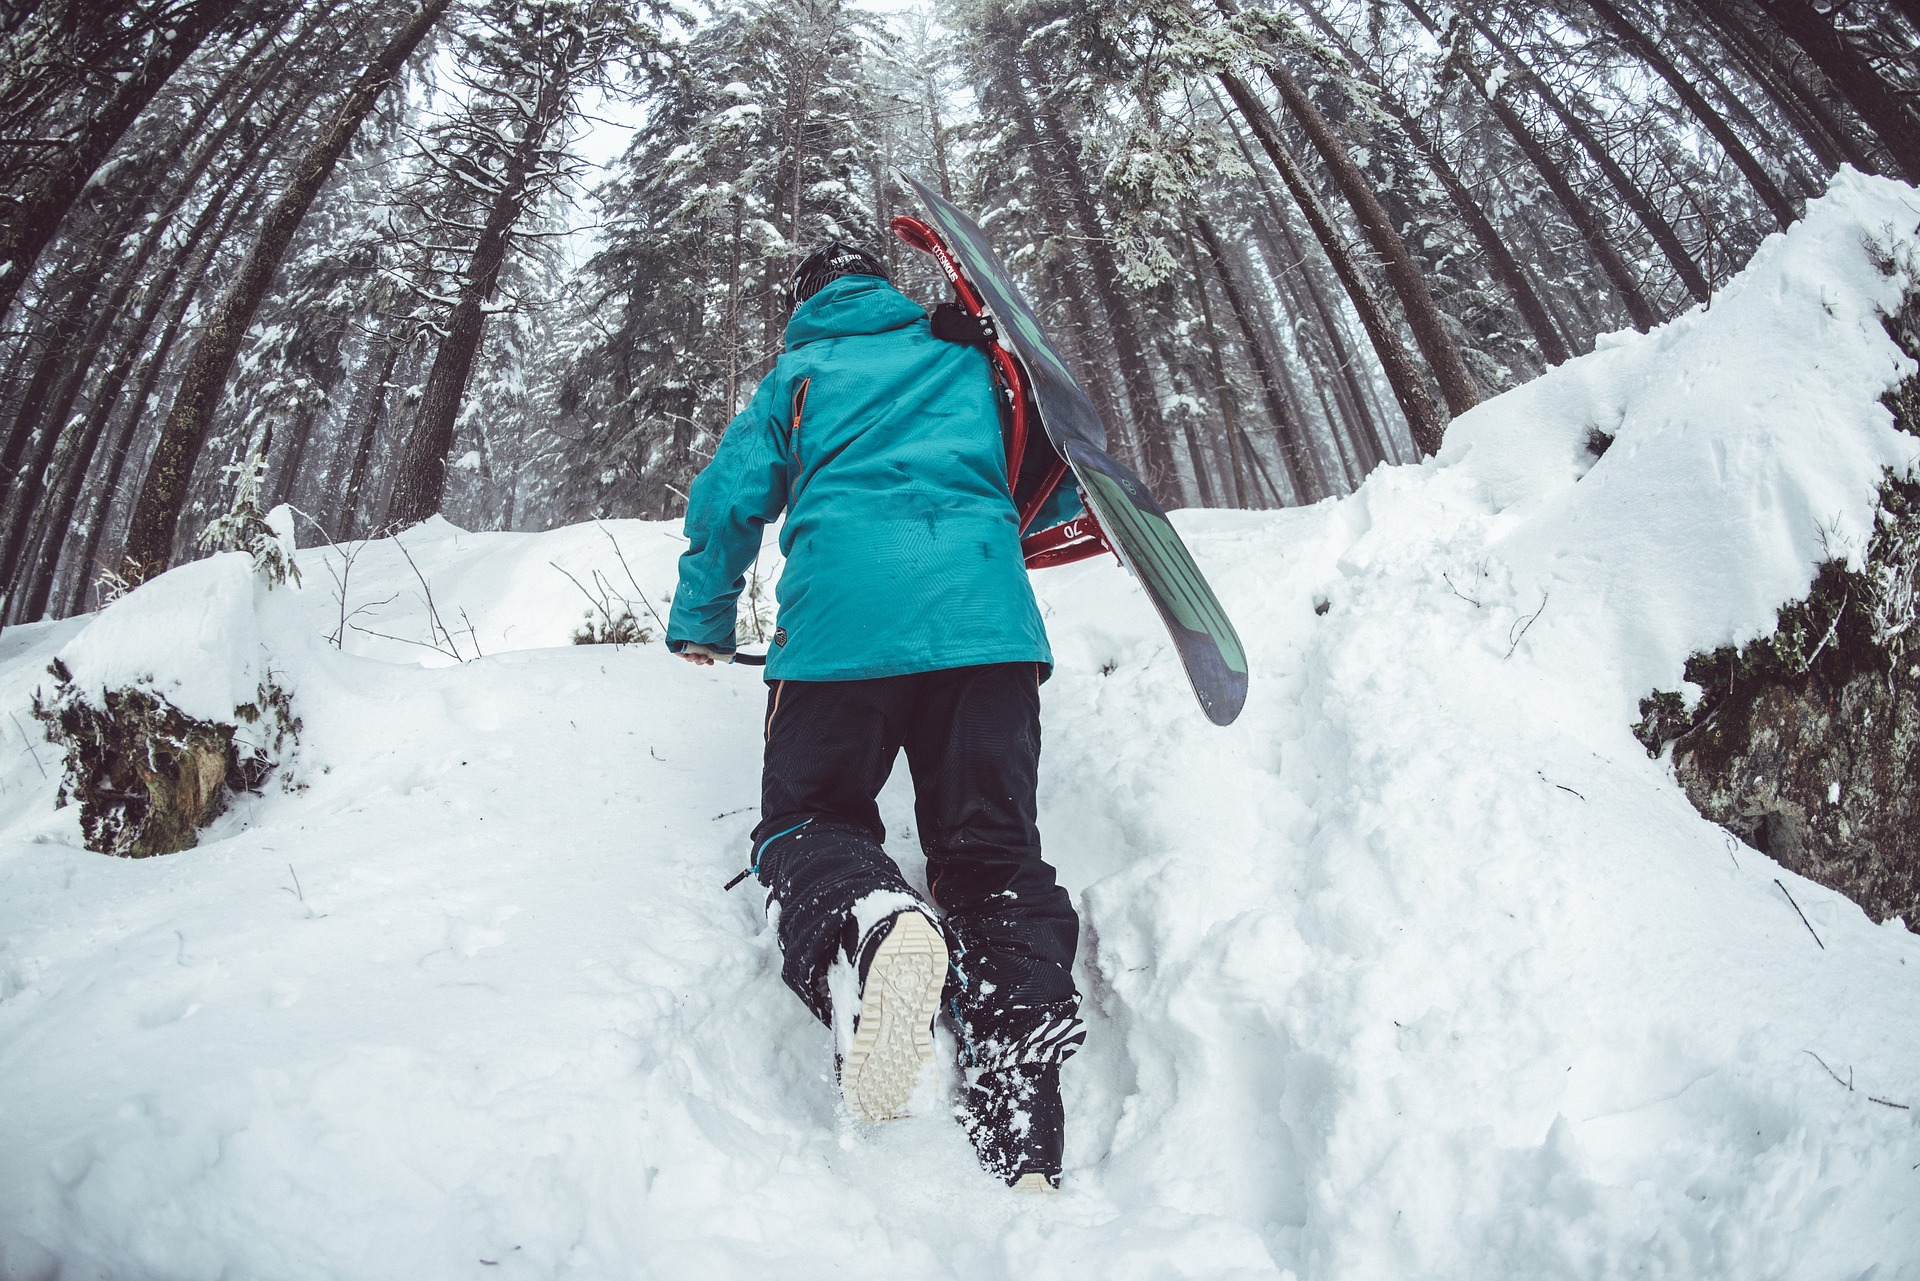 conseil pantalon ski femme